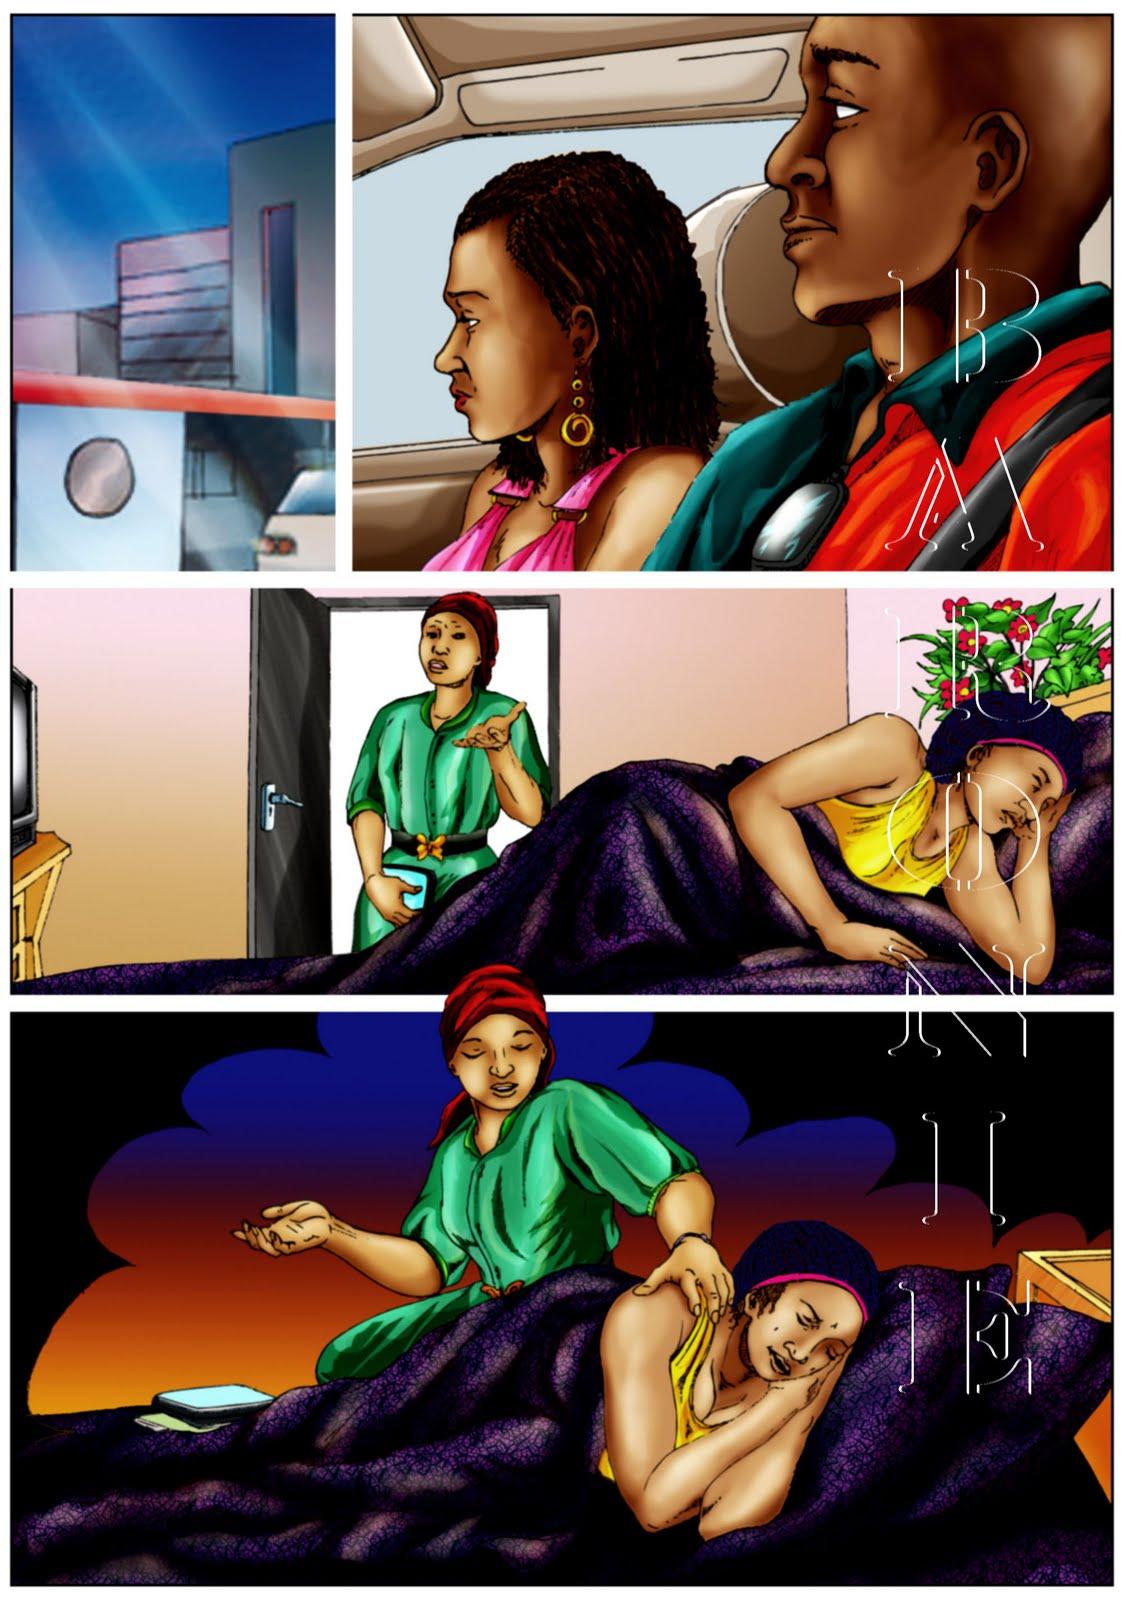 http://1.bp.blogspot.com/-SIkLNU7gHNM/TaRrEN2WzwI/AAAAAAAAAVQ/FG8KX4f6BFY/s1600/Adam%2B%2526%2BEve%2B%25287%2529%2BFull%2Bdetail%2Bart_by_Sean_baronie_concepts_Comic_artist_federal_republic_of_nigeria.jpg